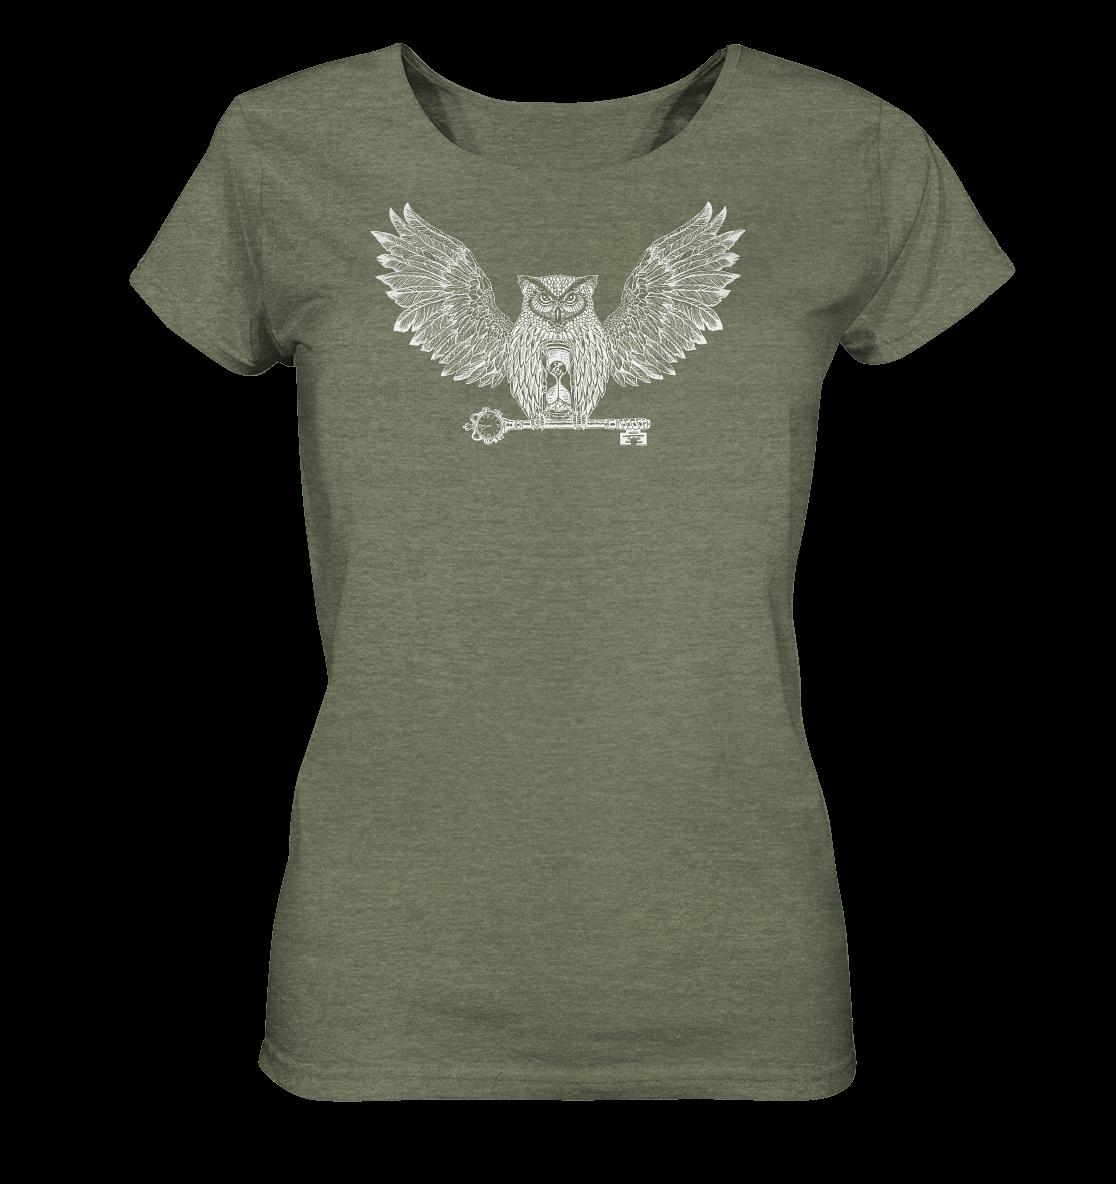 front-ladies-organic-shirt-meliert-616b52-1116x-4.png